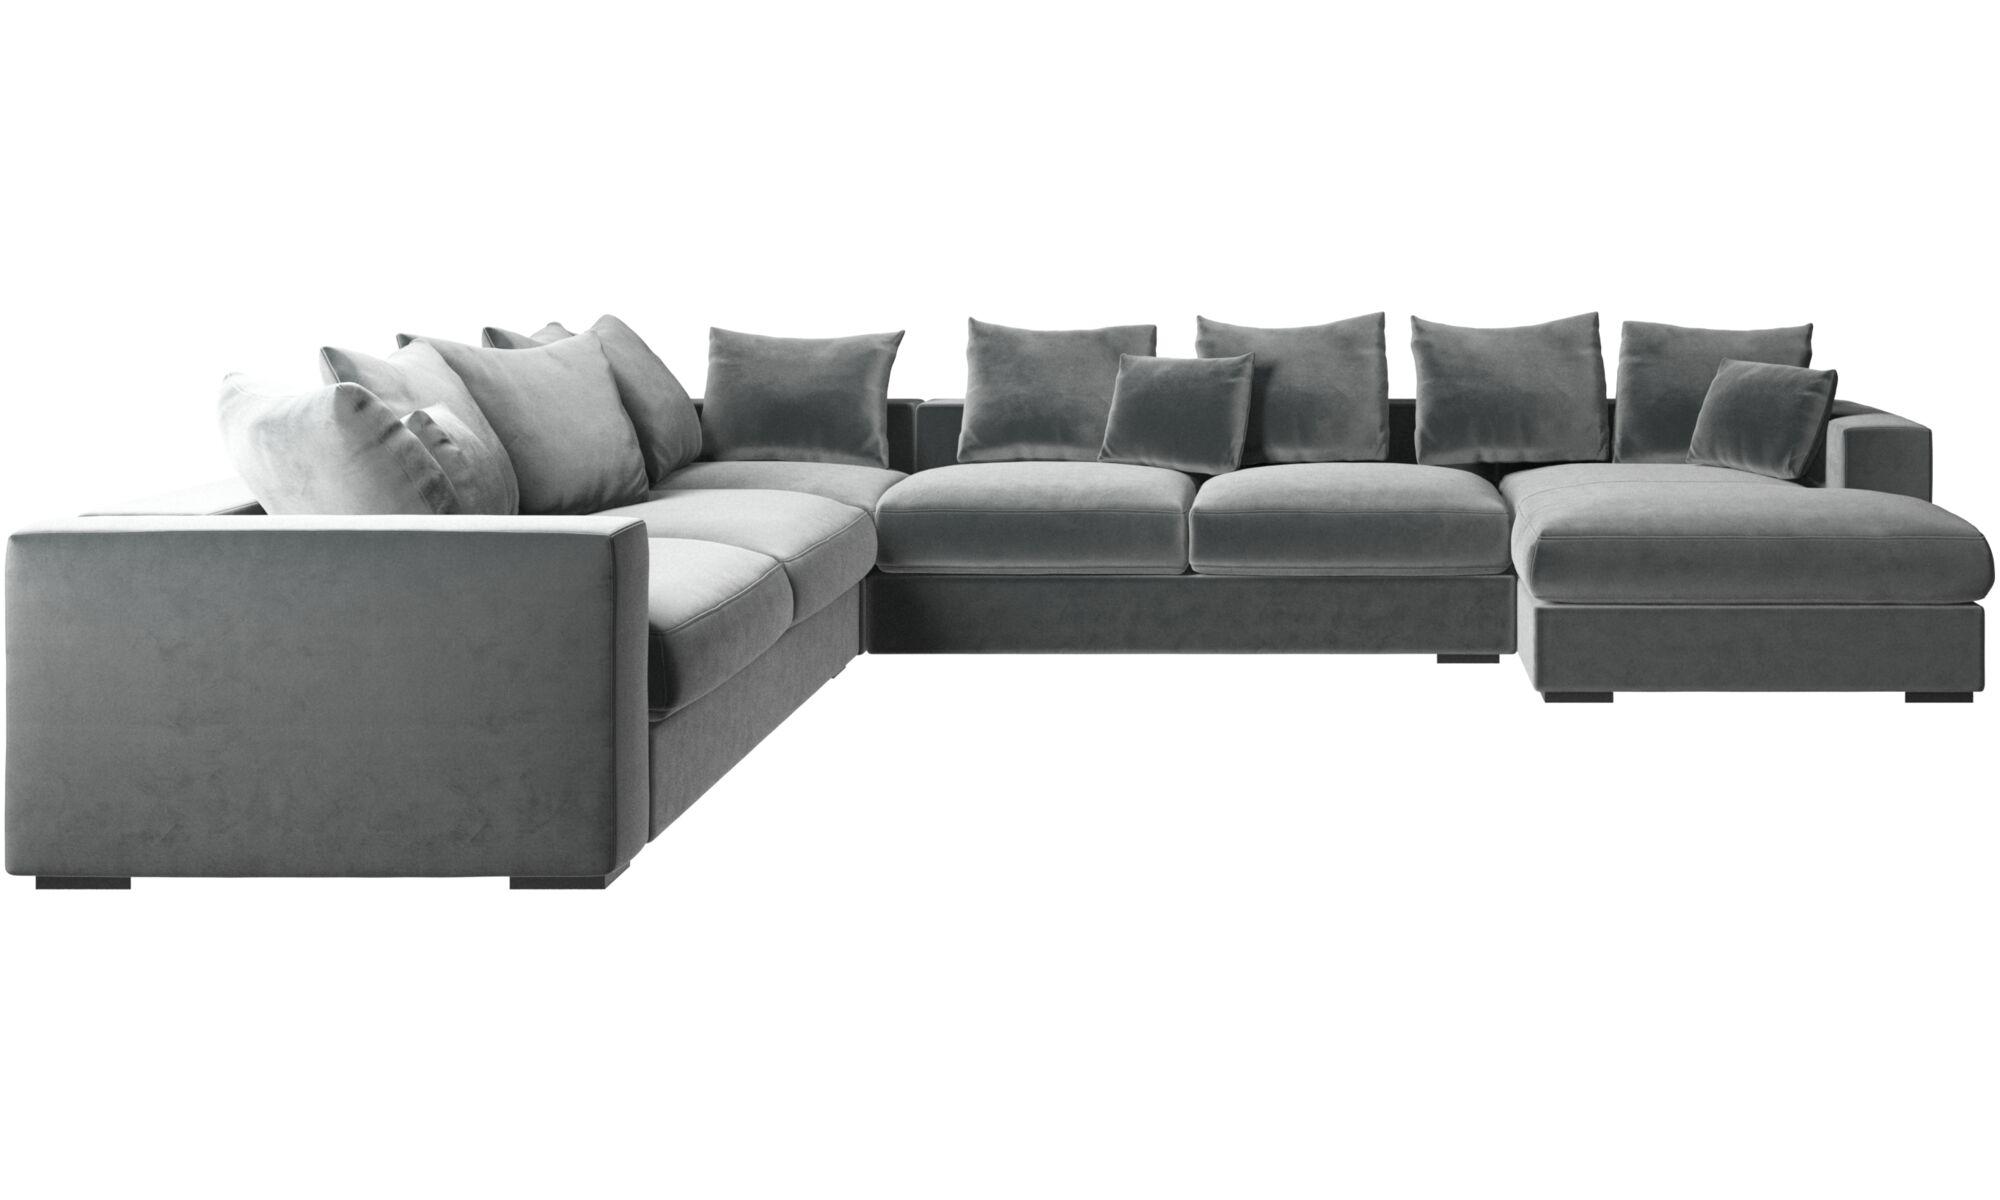 Canapés d'angle - Canapé d'angle Cenova avec méridienne - Vert - Tissu